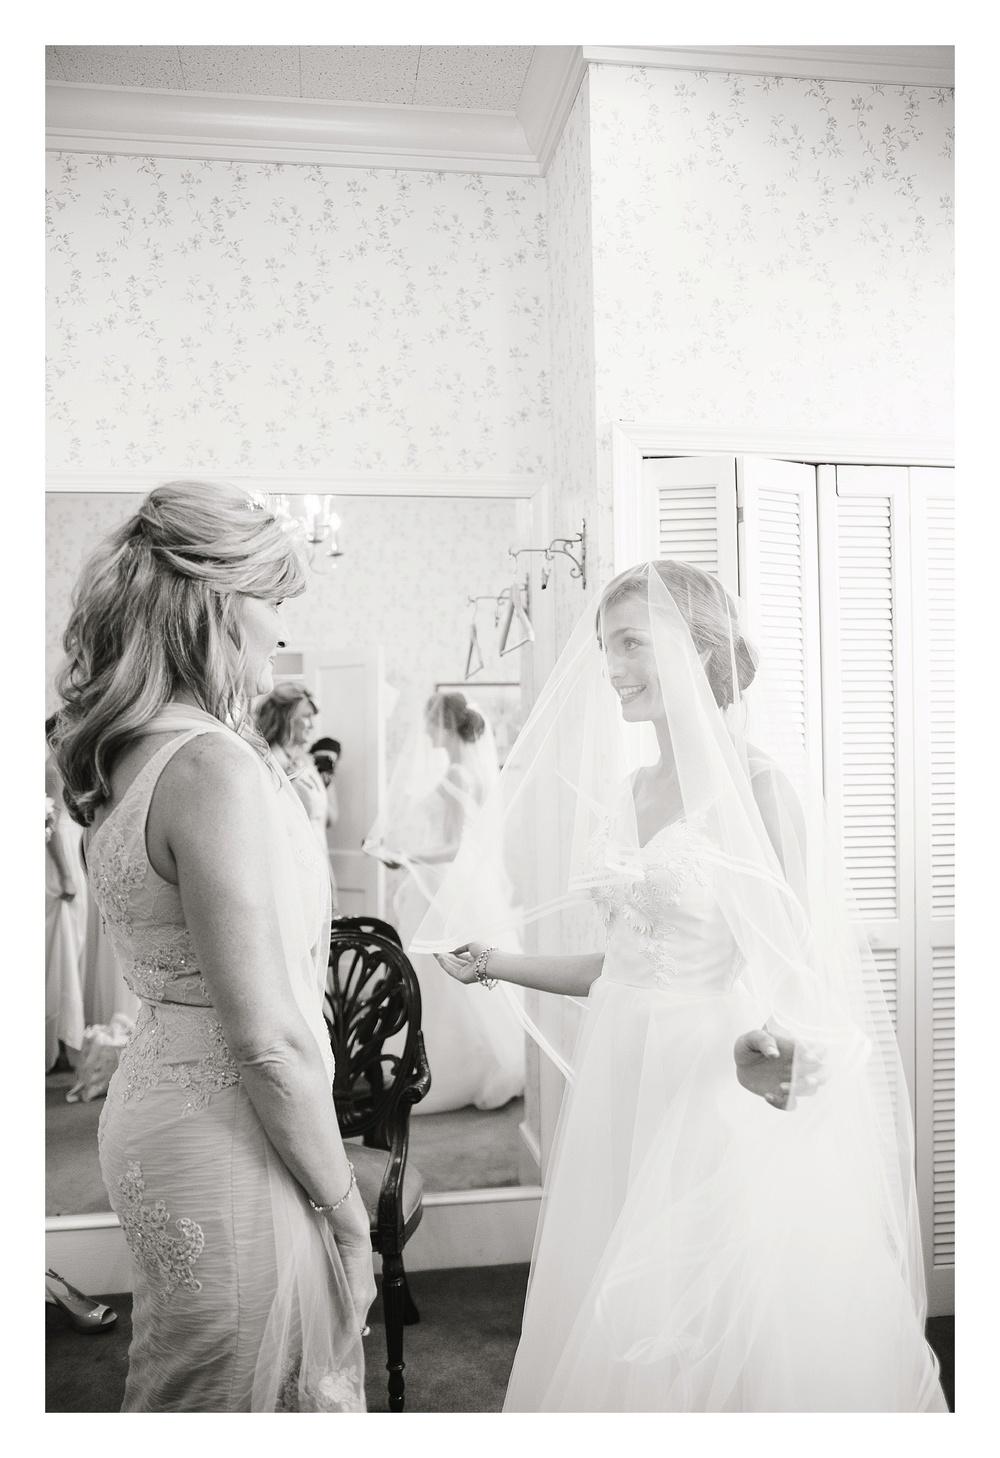 getting ready at First Baptist church of greensboro wedding photos